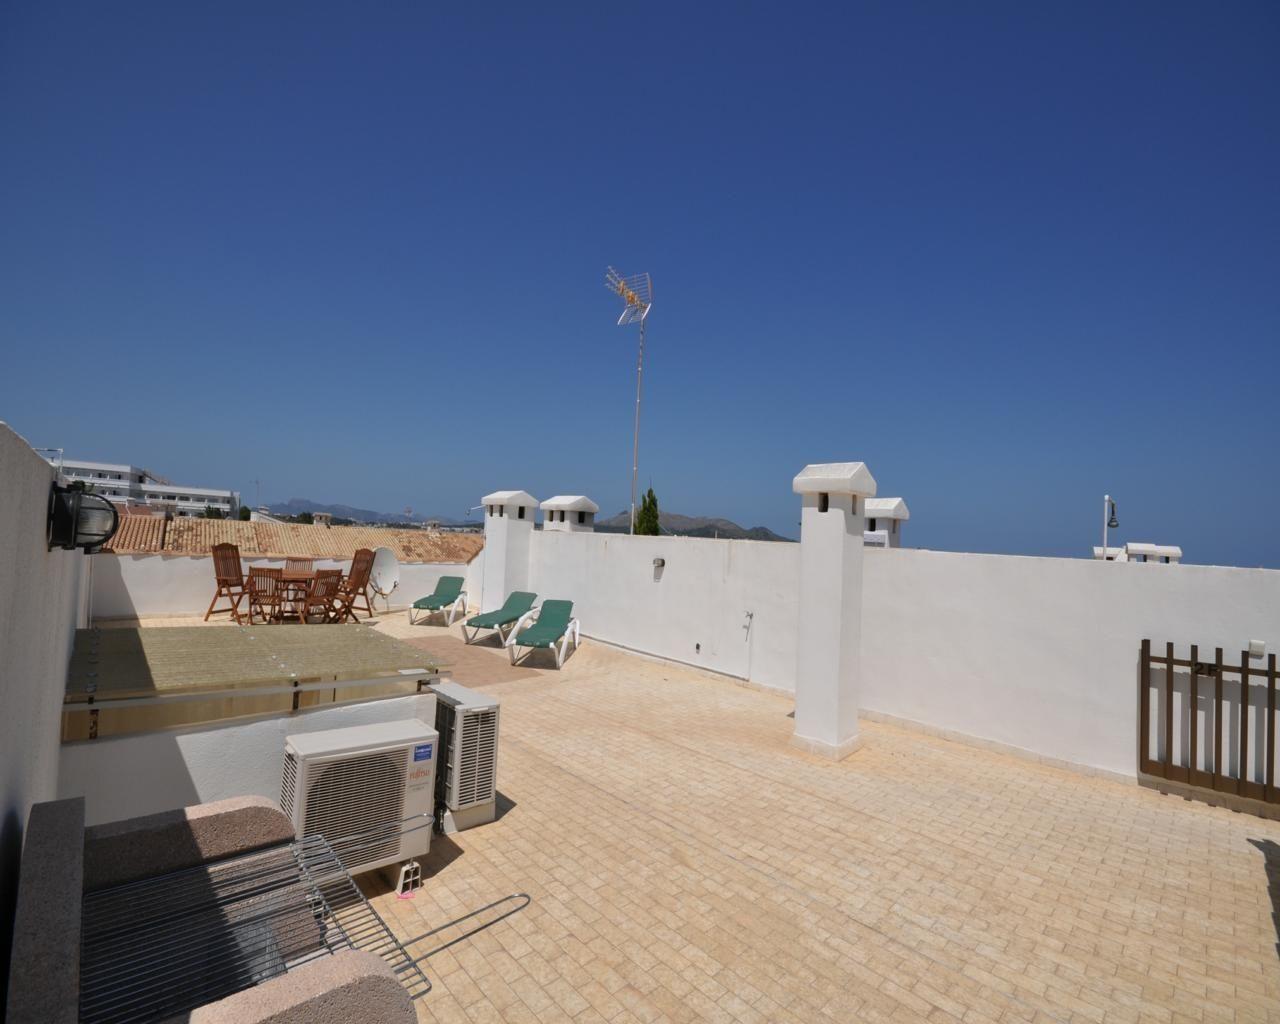 Bild 14 - Ferienwohnung Playa de Alcudia - Ref.: 150178-526 - Objekt 150178-526